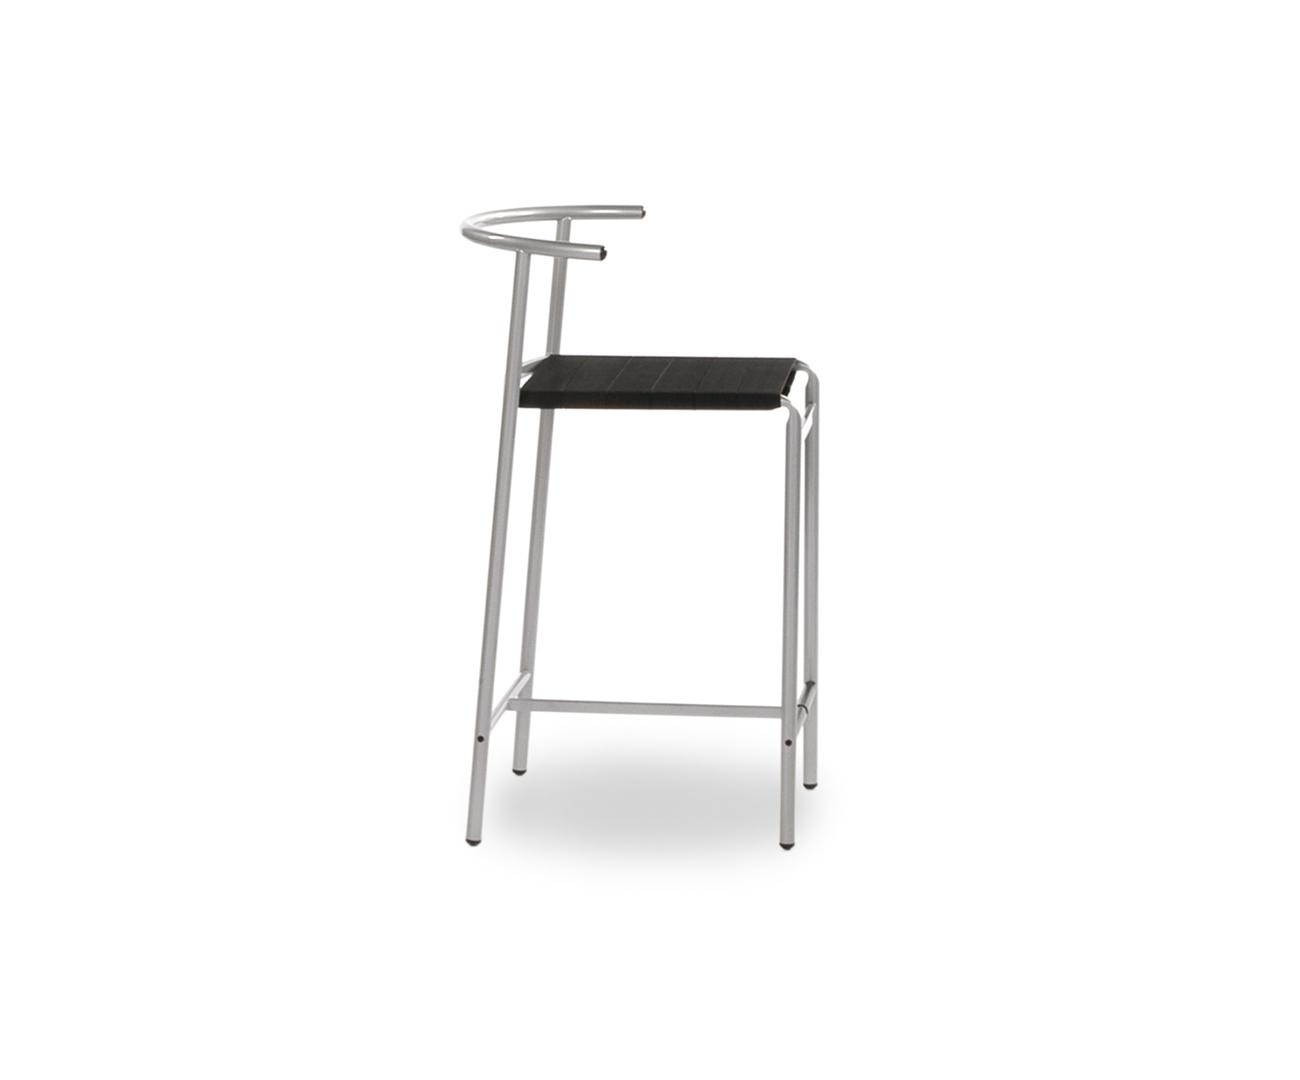 Caf Chair Collezione Baleri Italia Sedie Philippe Starck Design